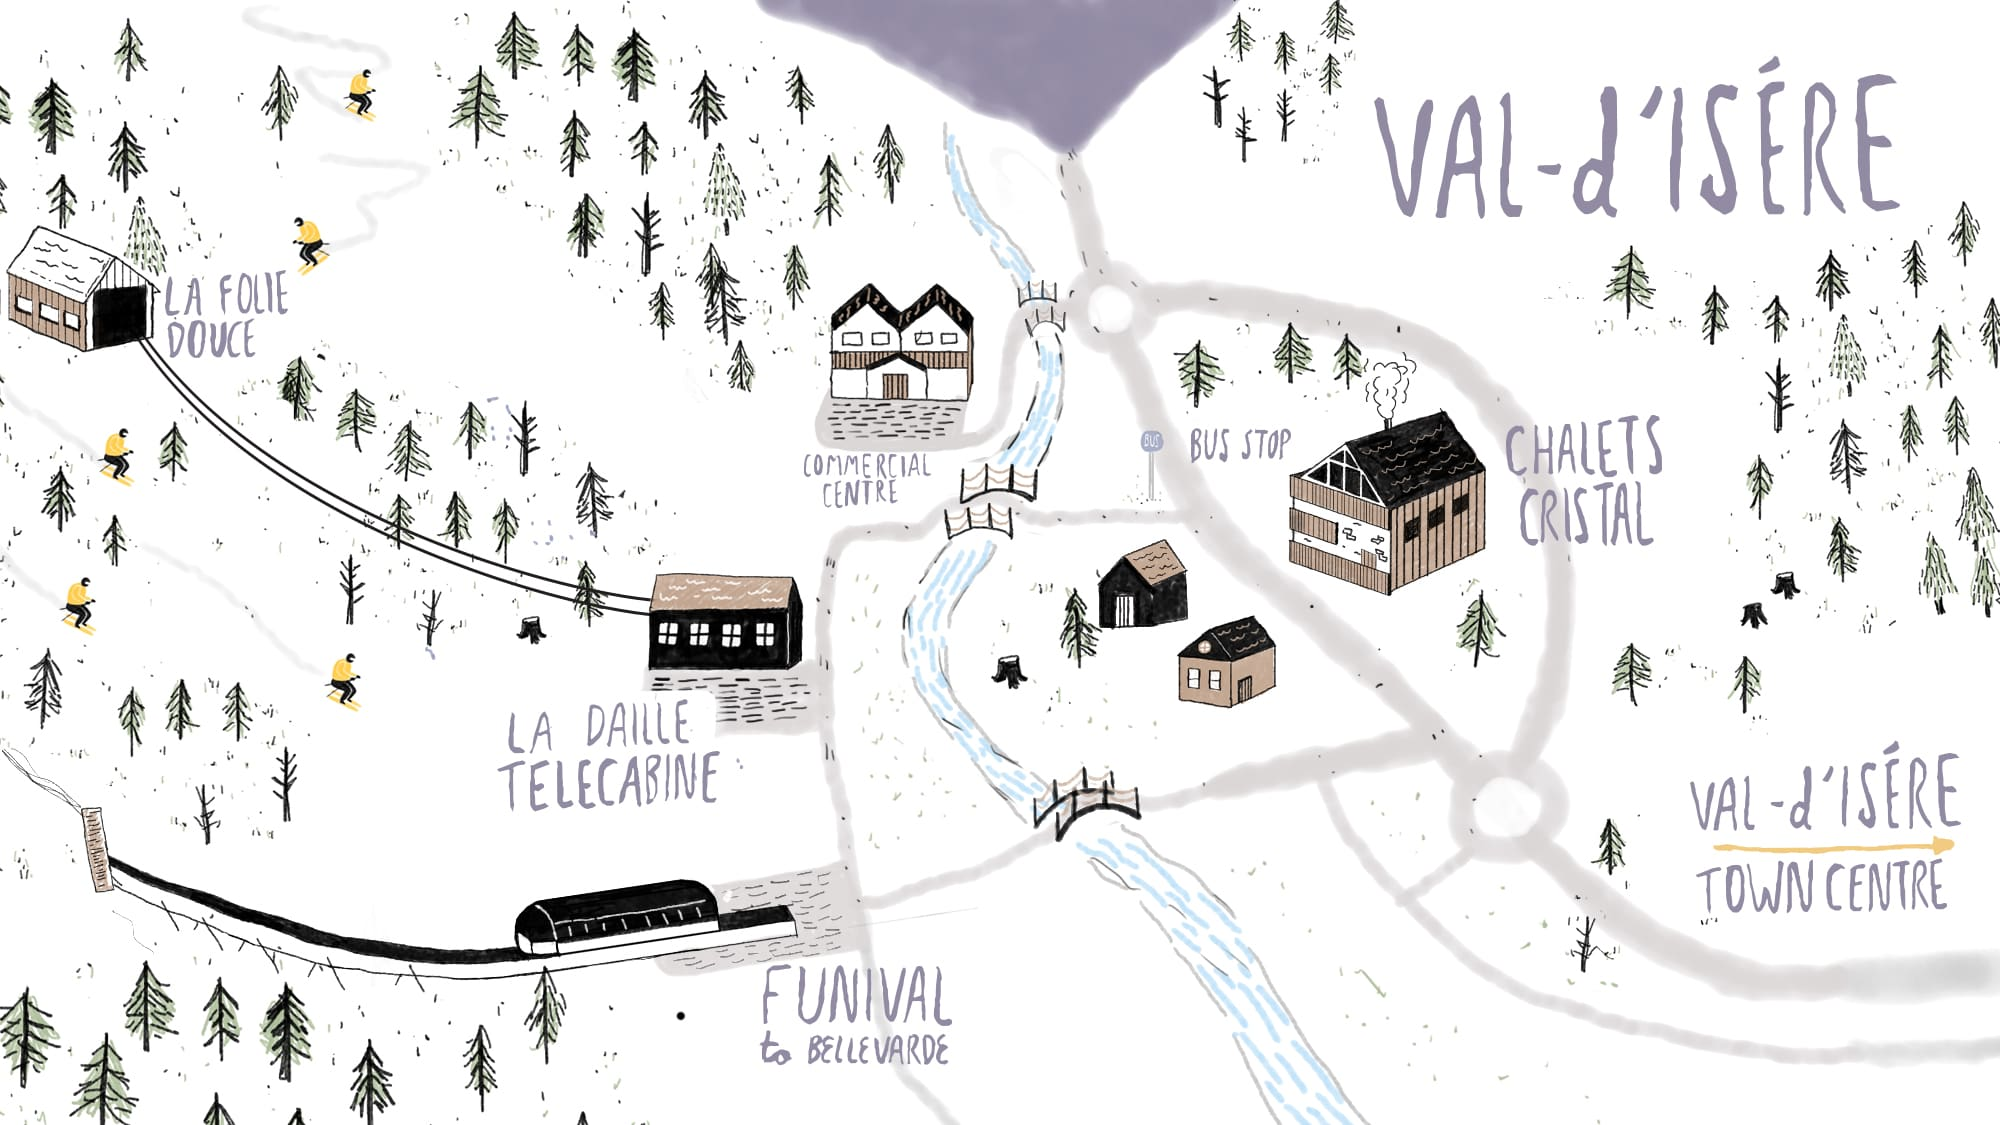 Val DIsere Chalets Ski Holidays Val DIsere Ski Chalets Val DIsere